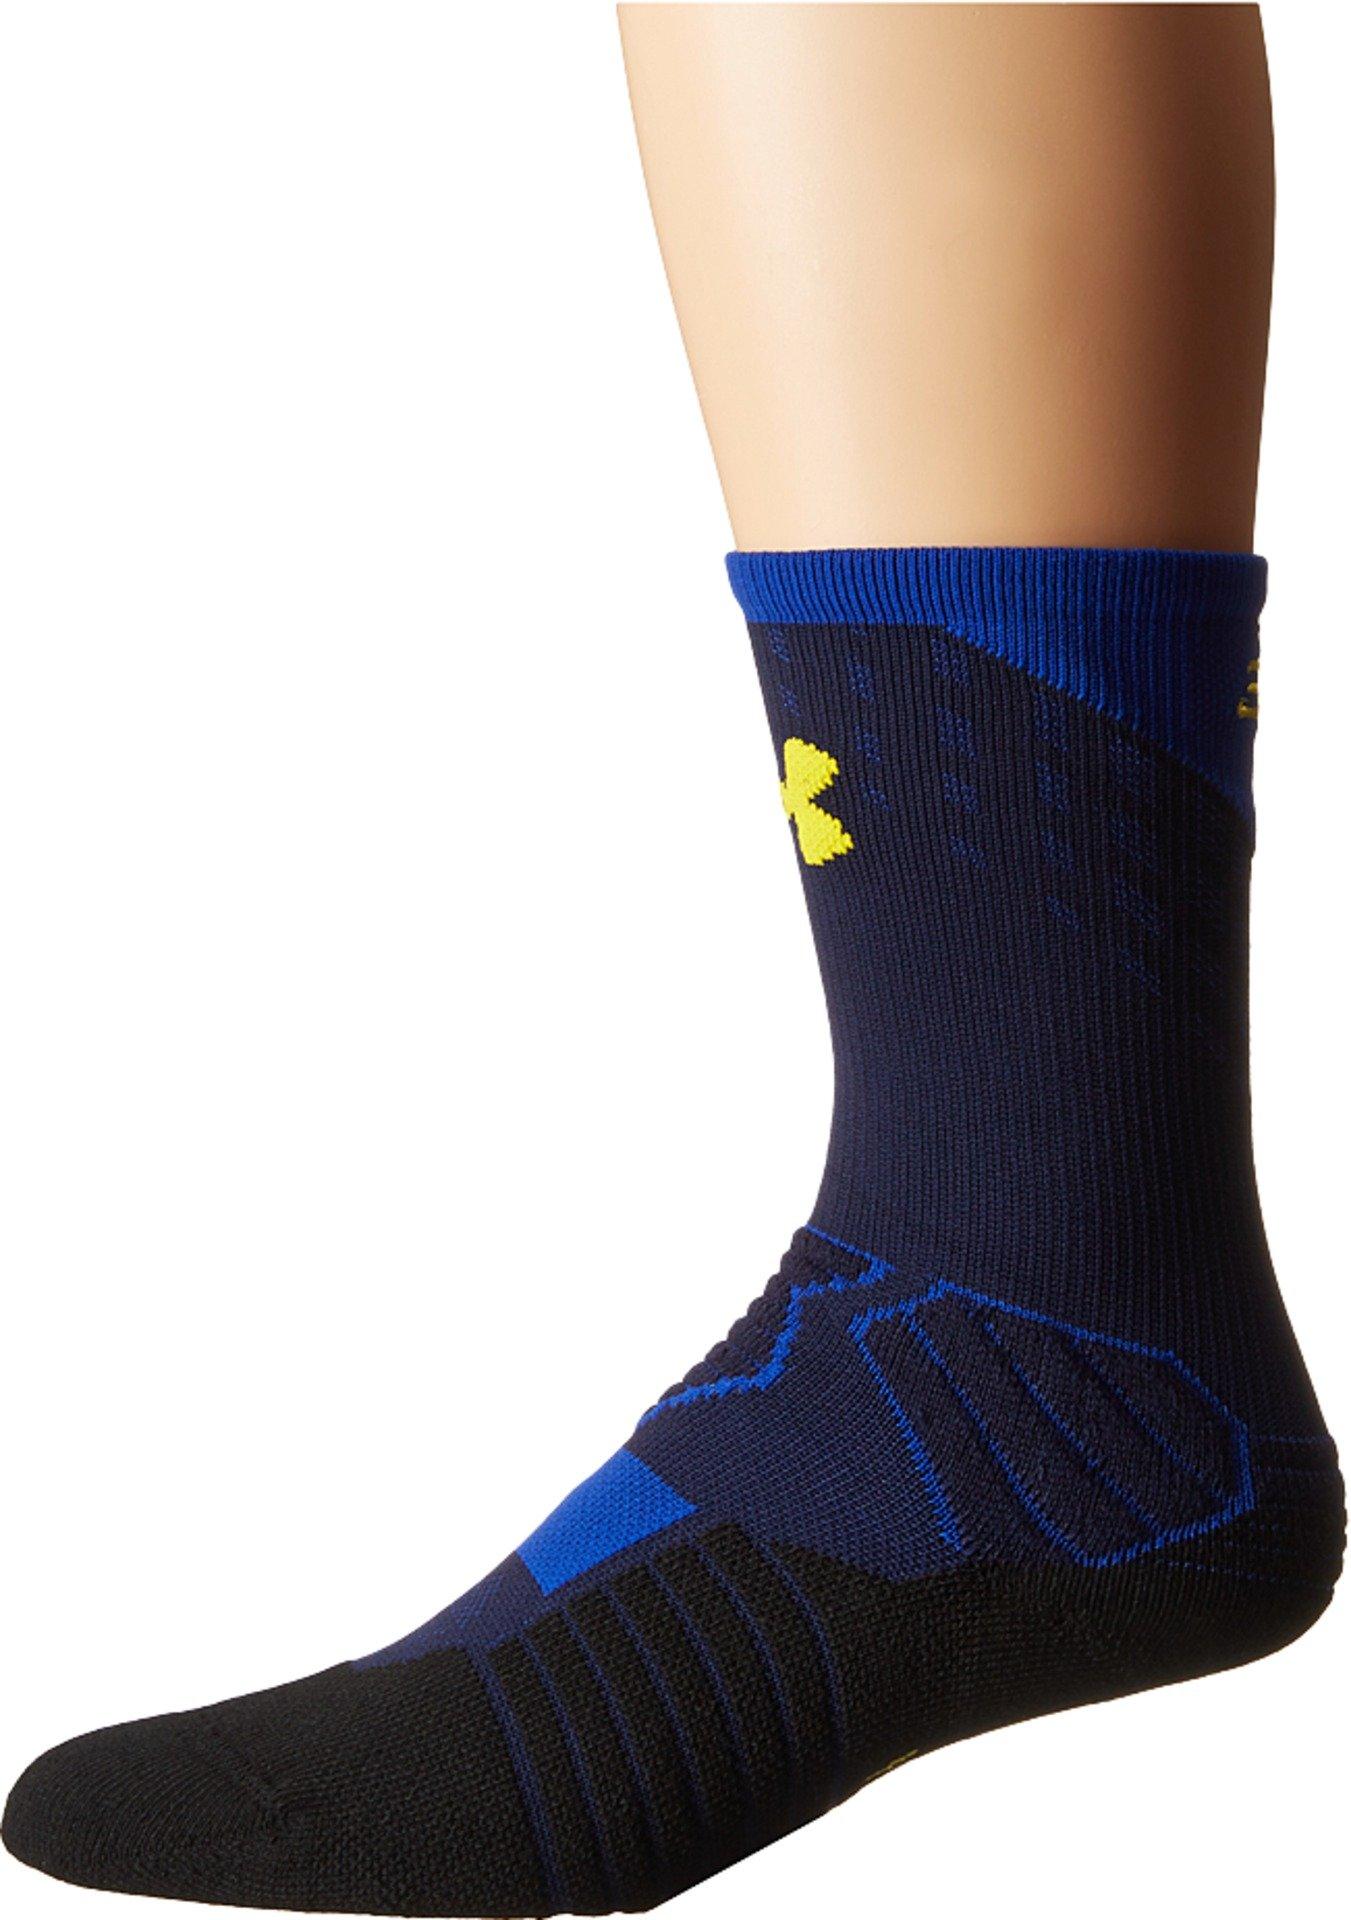 Under Armour Boy's UA Basketball Curry Crew (Big Kid) Midnight Navy/Royal/Taxi Yellow Socks Youth LG (7-9 Big Kid Shoe)